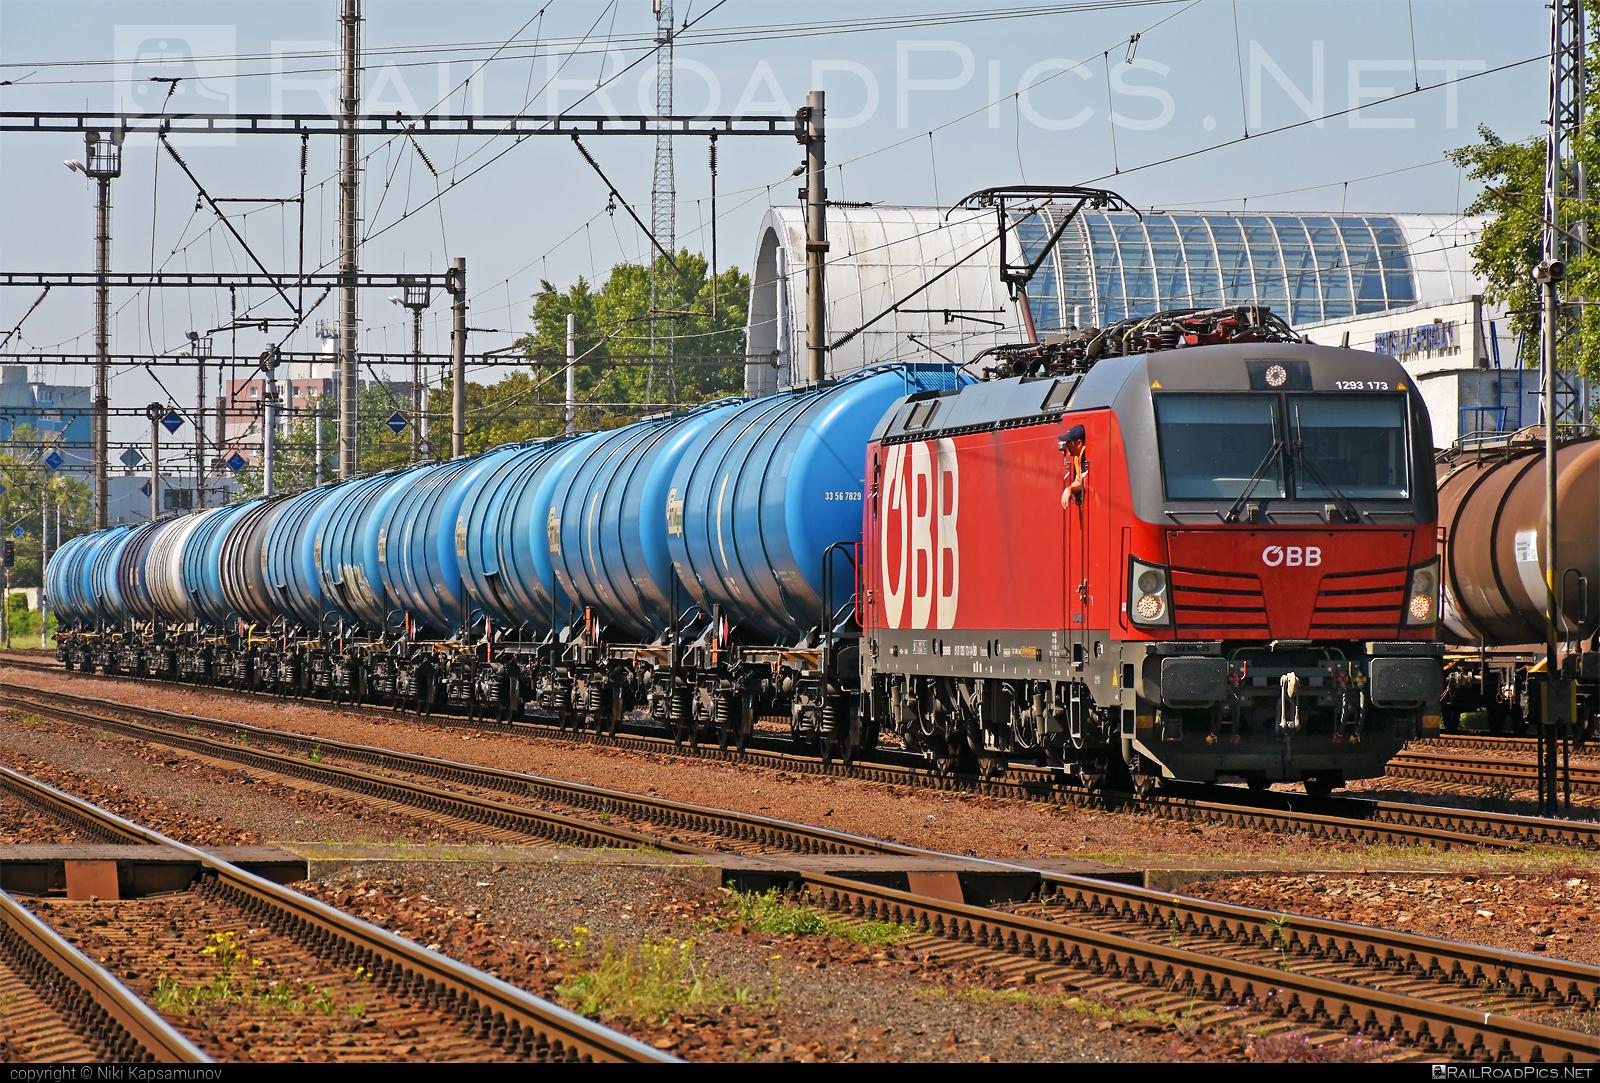 Siemens Vectron MS - 1293 173 operated by Rail Cargo Austria AG #kesselwagen #obb #osterreichischebundesbahnen #rcw #rtiwagon #siemens #siemensvectron #siemensvectronms #tankwagon #vectron #vectronms